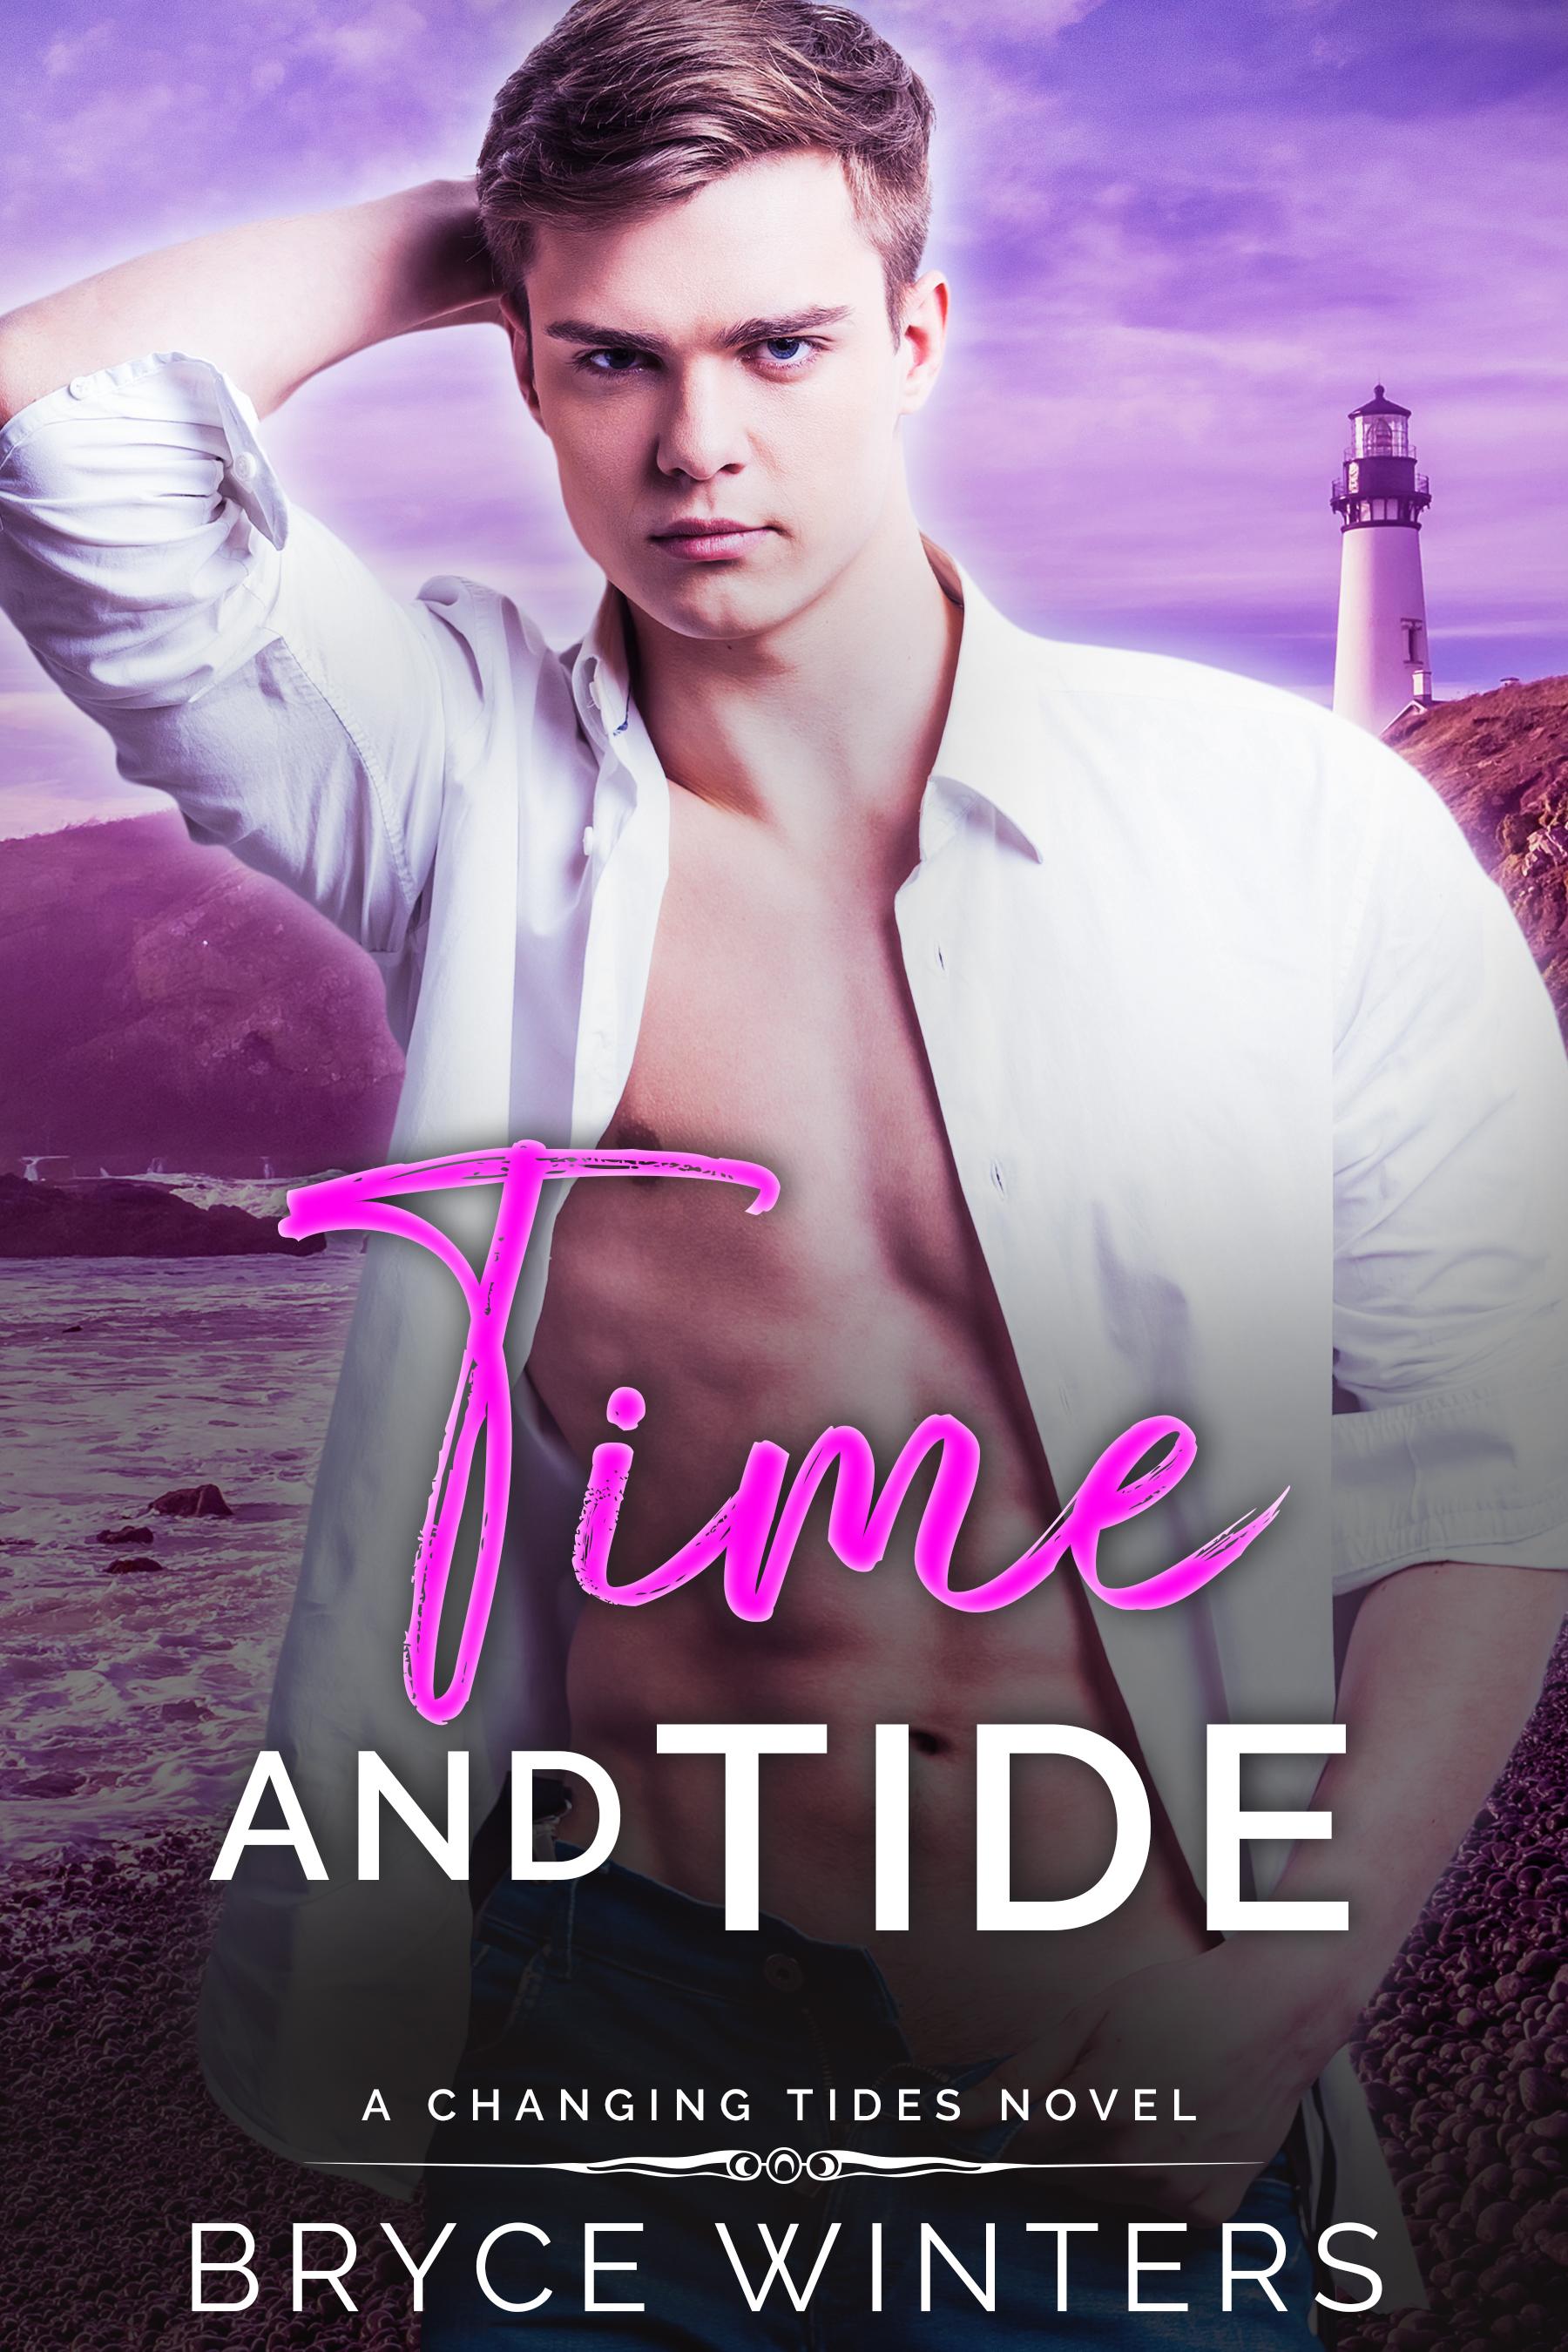 brycewinters_timeandtide_ebook_v2